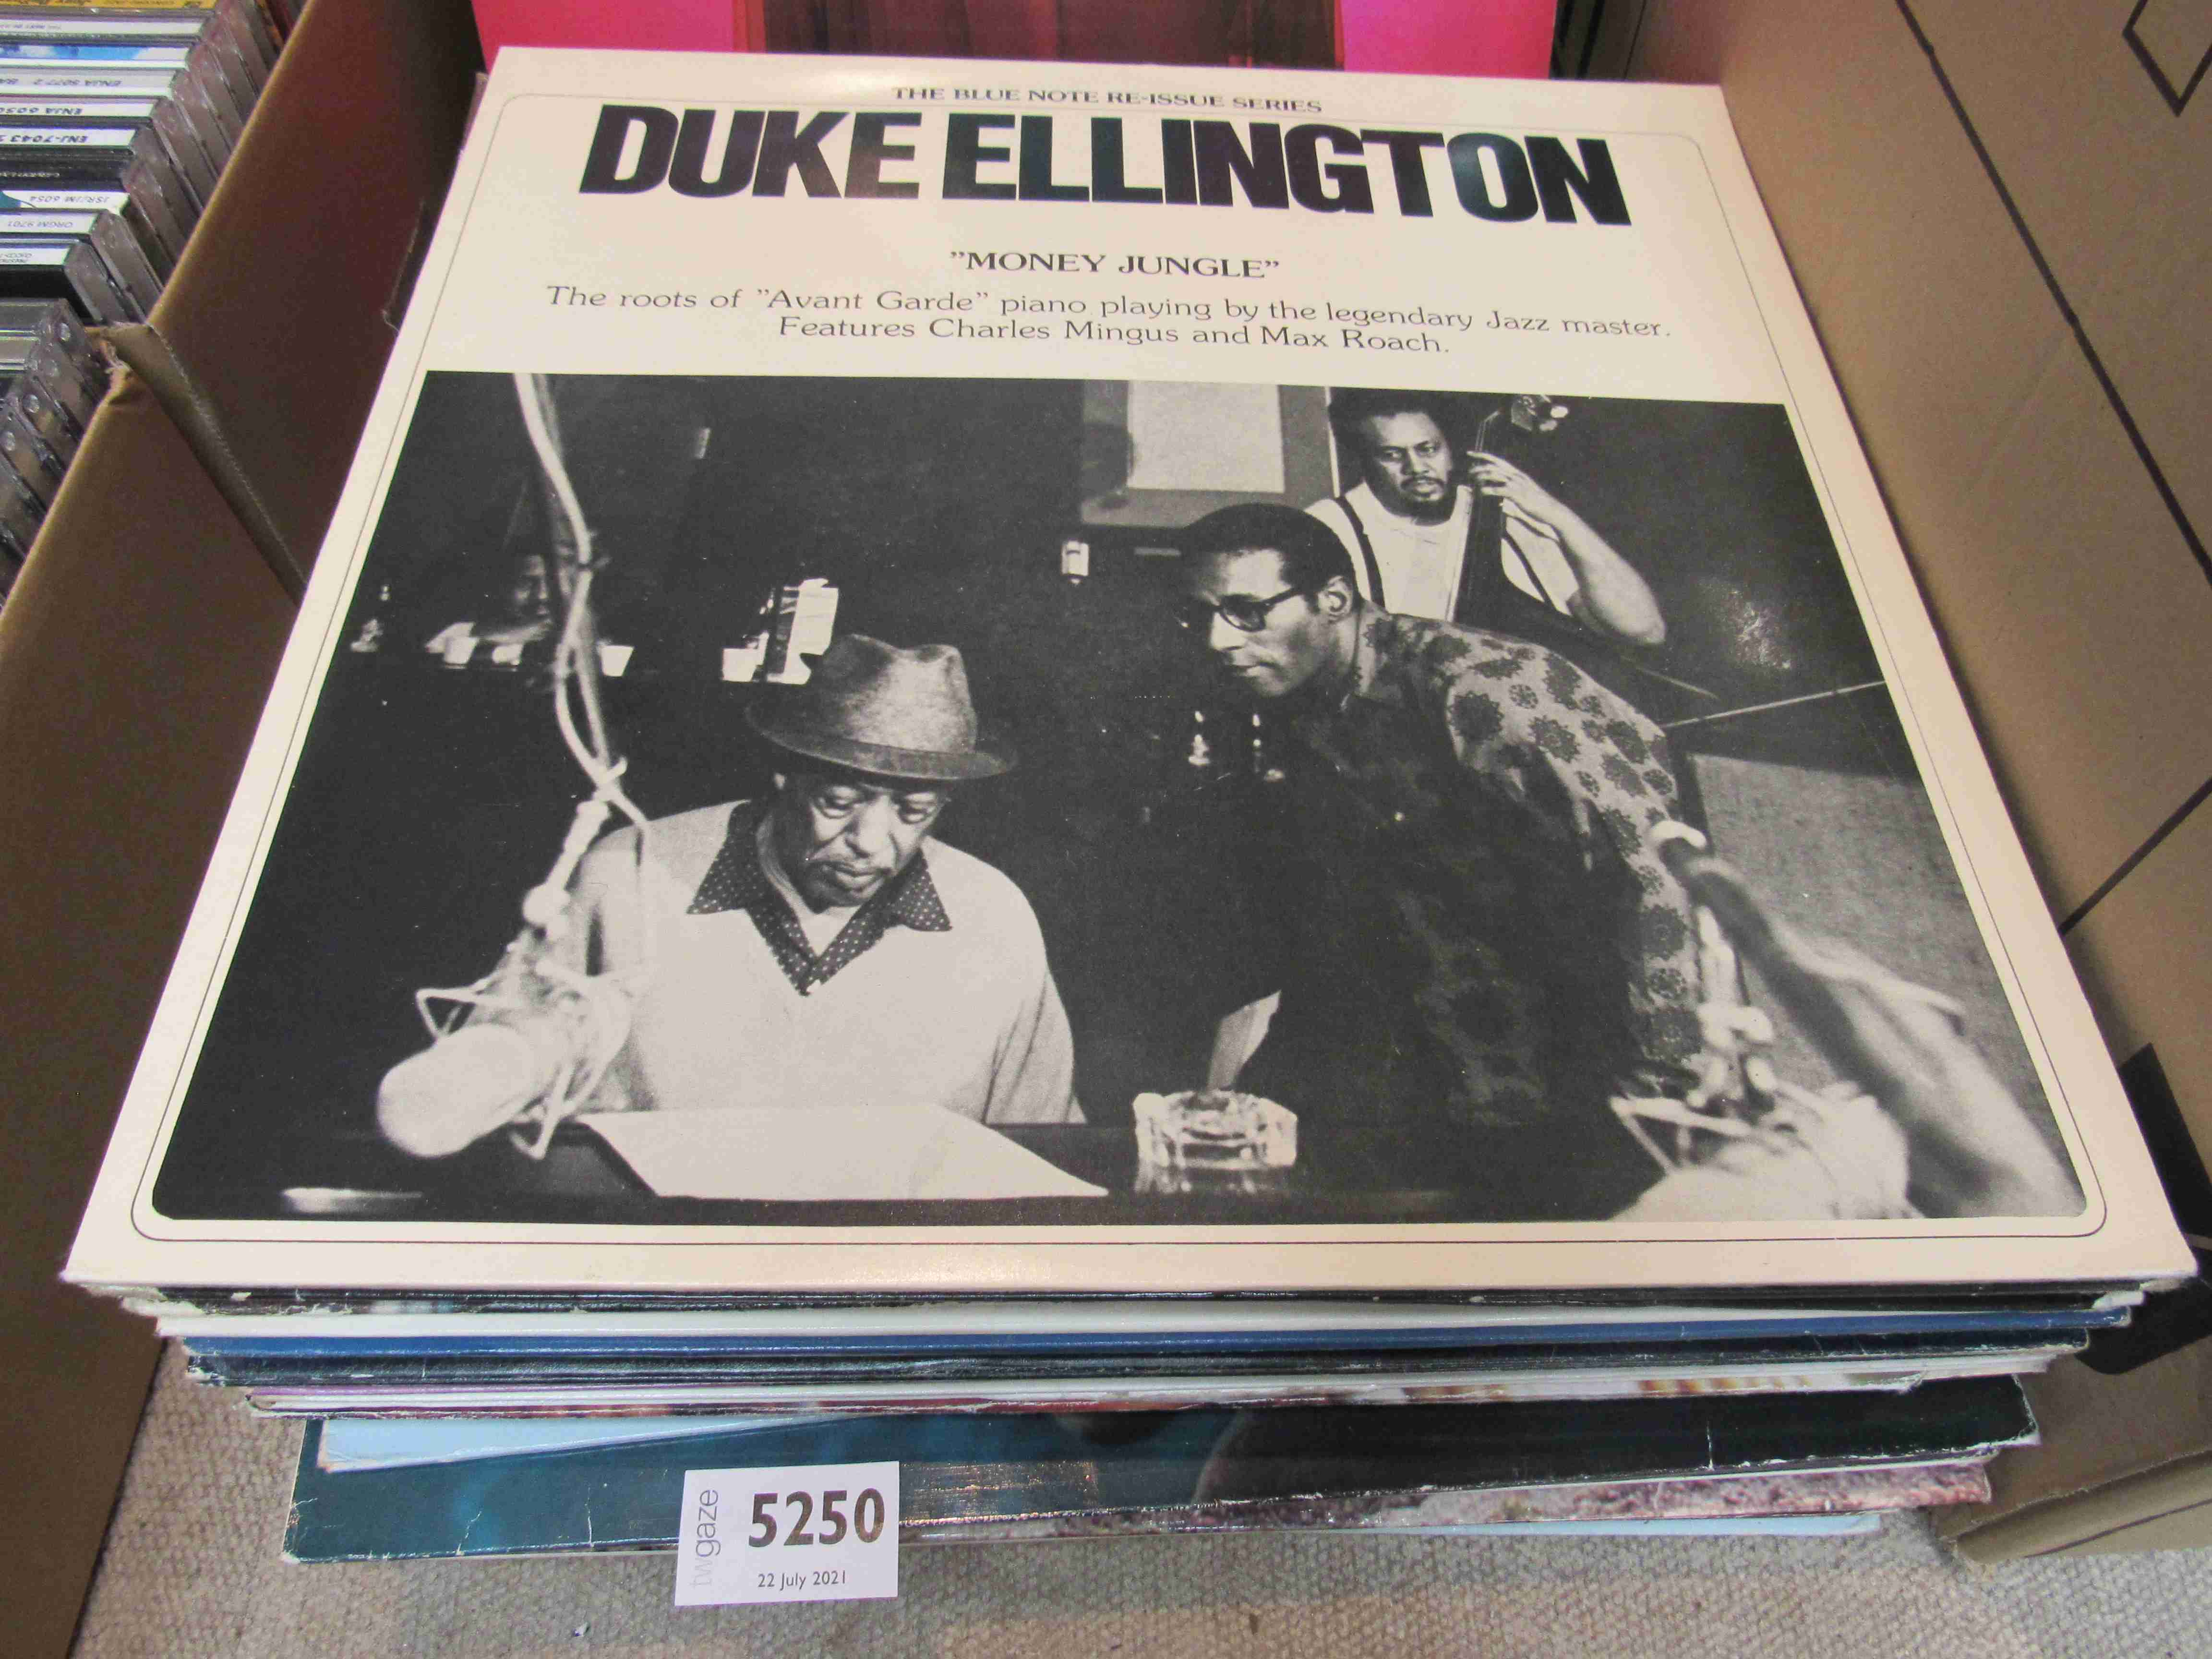 Thirty seven assorted piano Jazz LP's including Mick Pyne, Duke Ellington, Ralph Sutton,